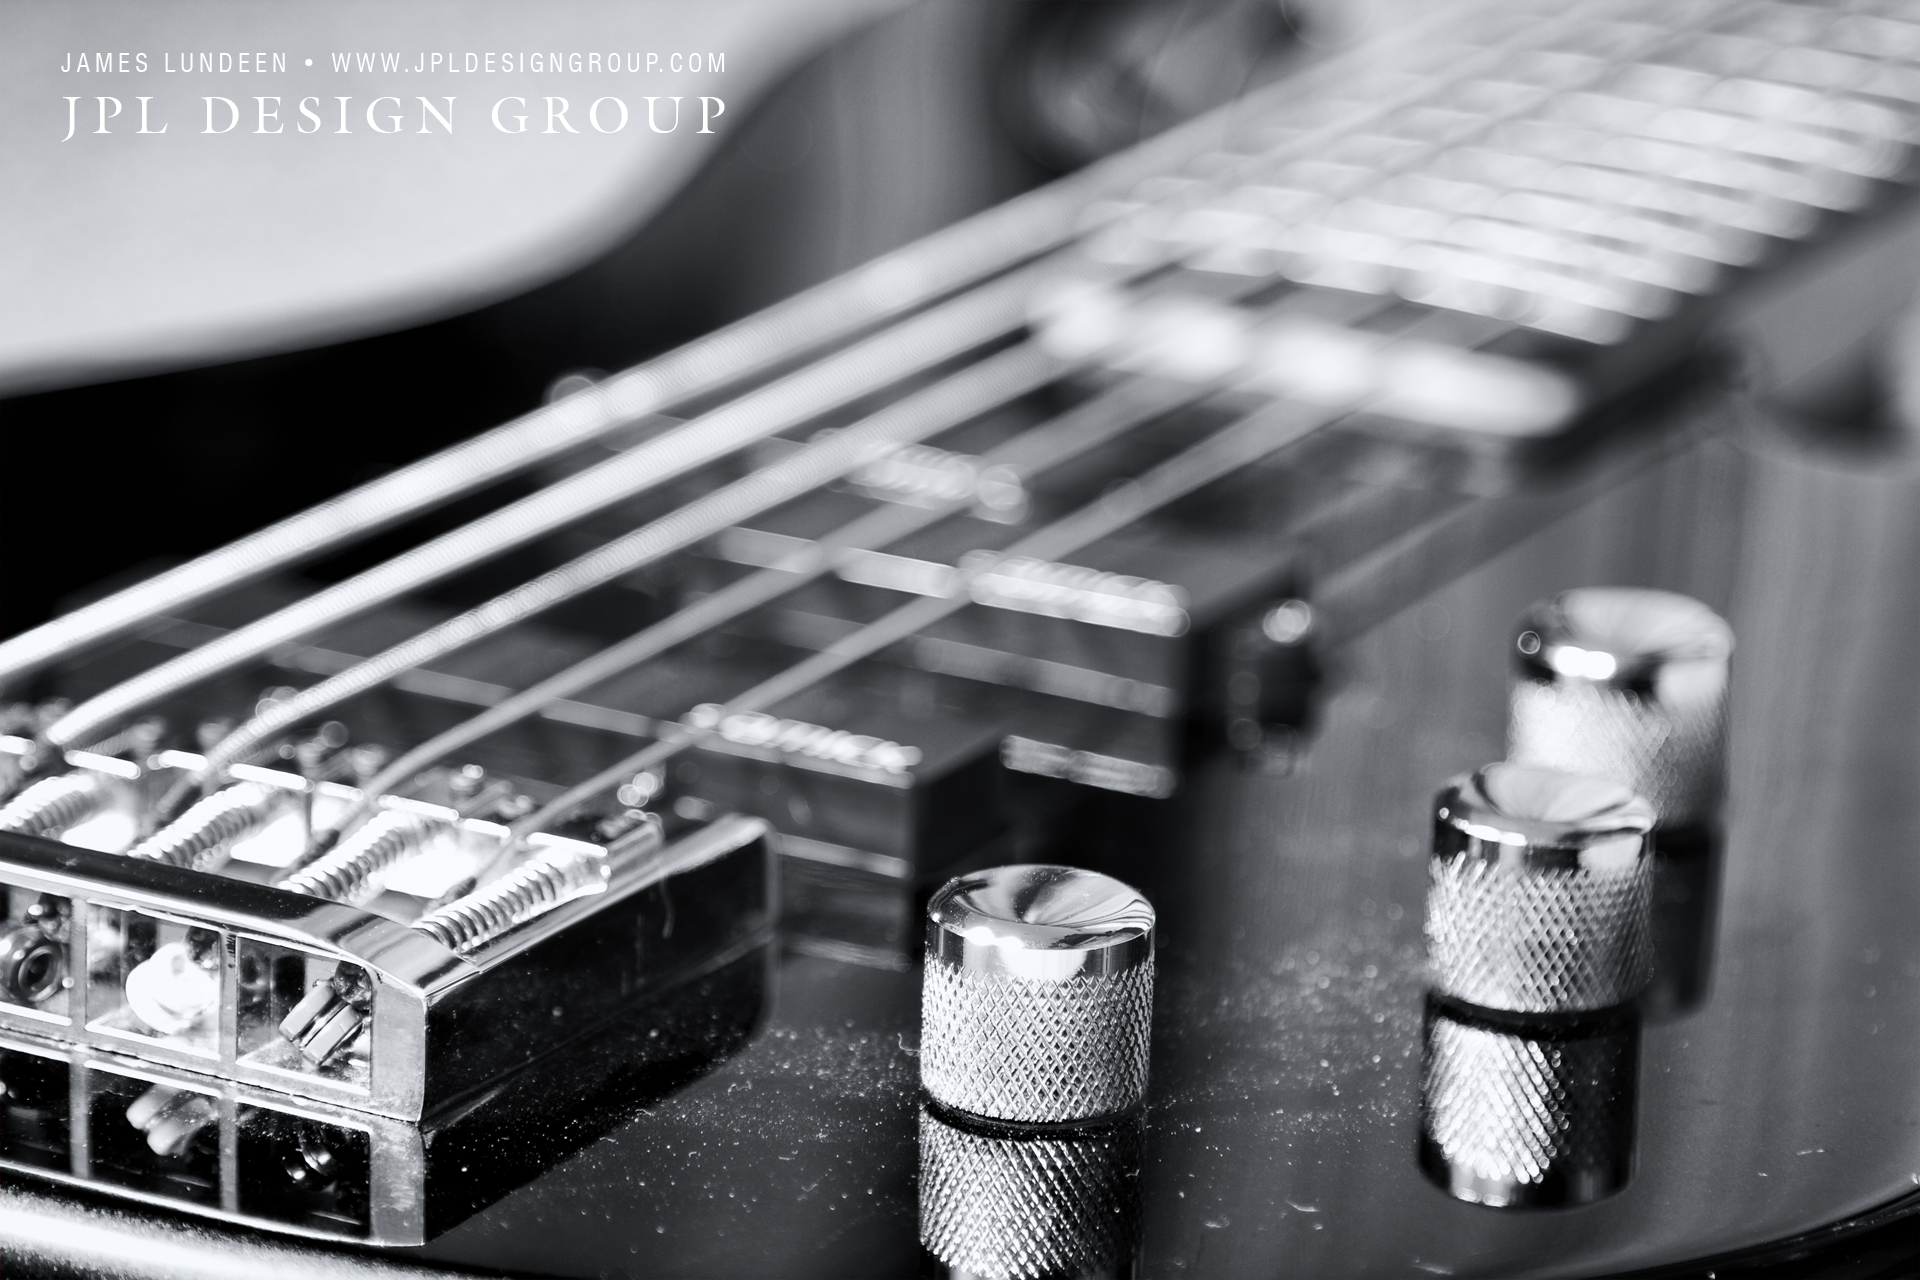 5 String Samick Bass Guitar